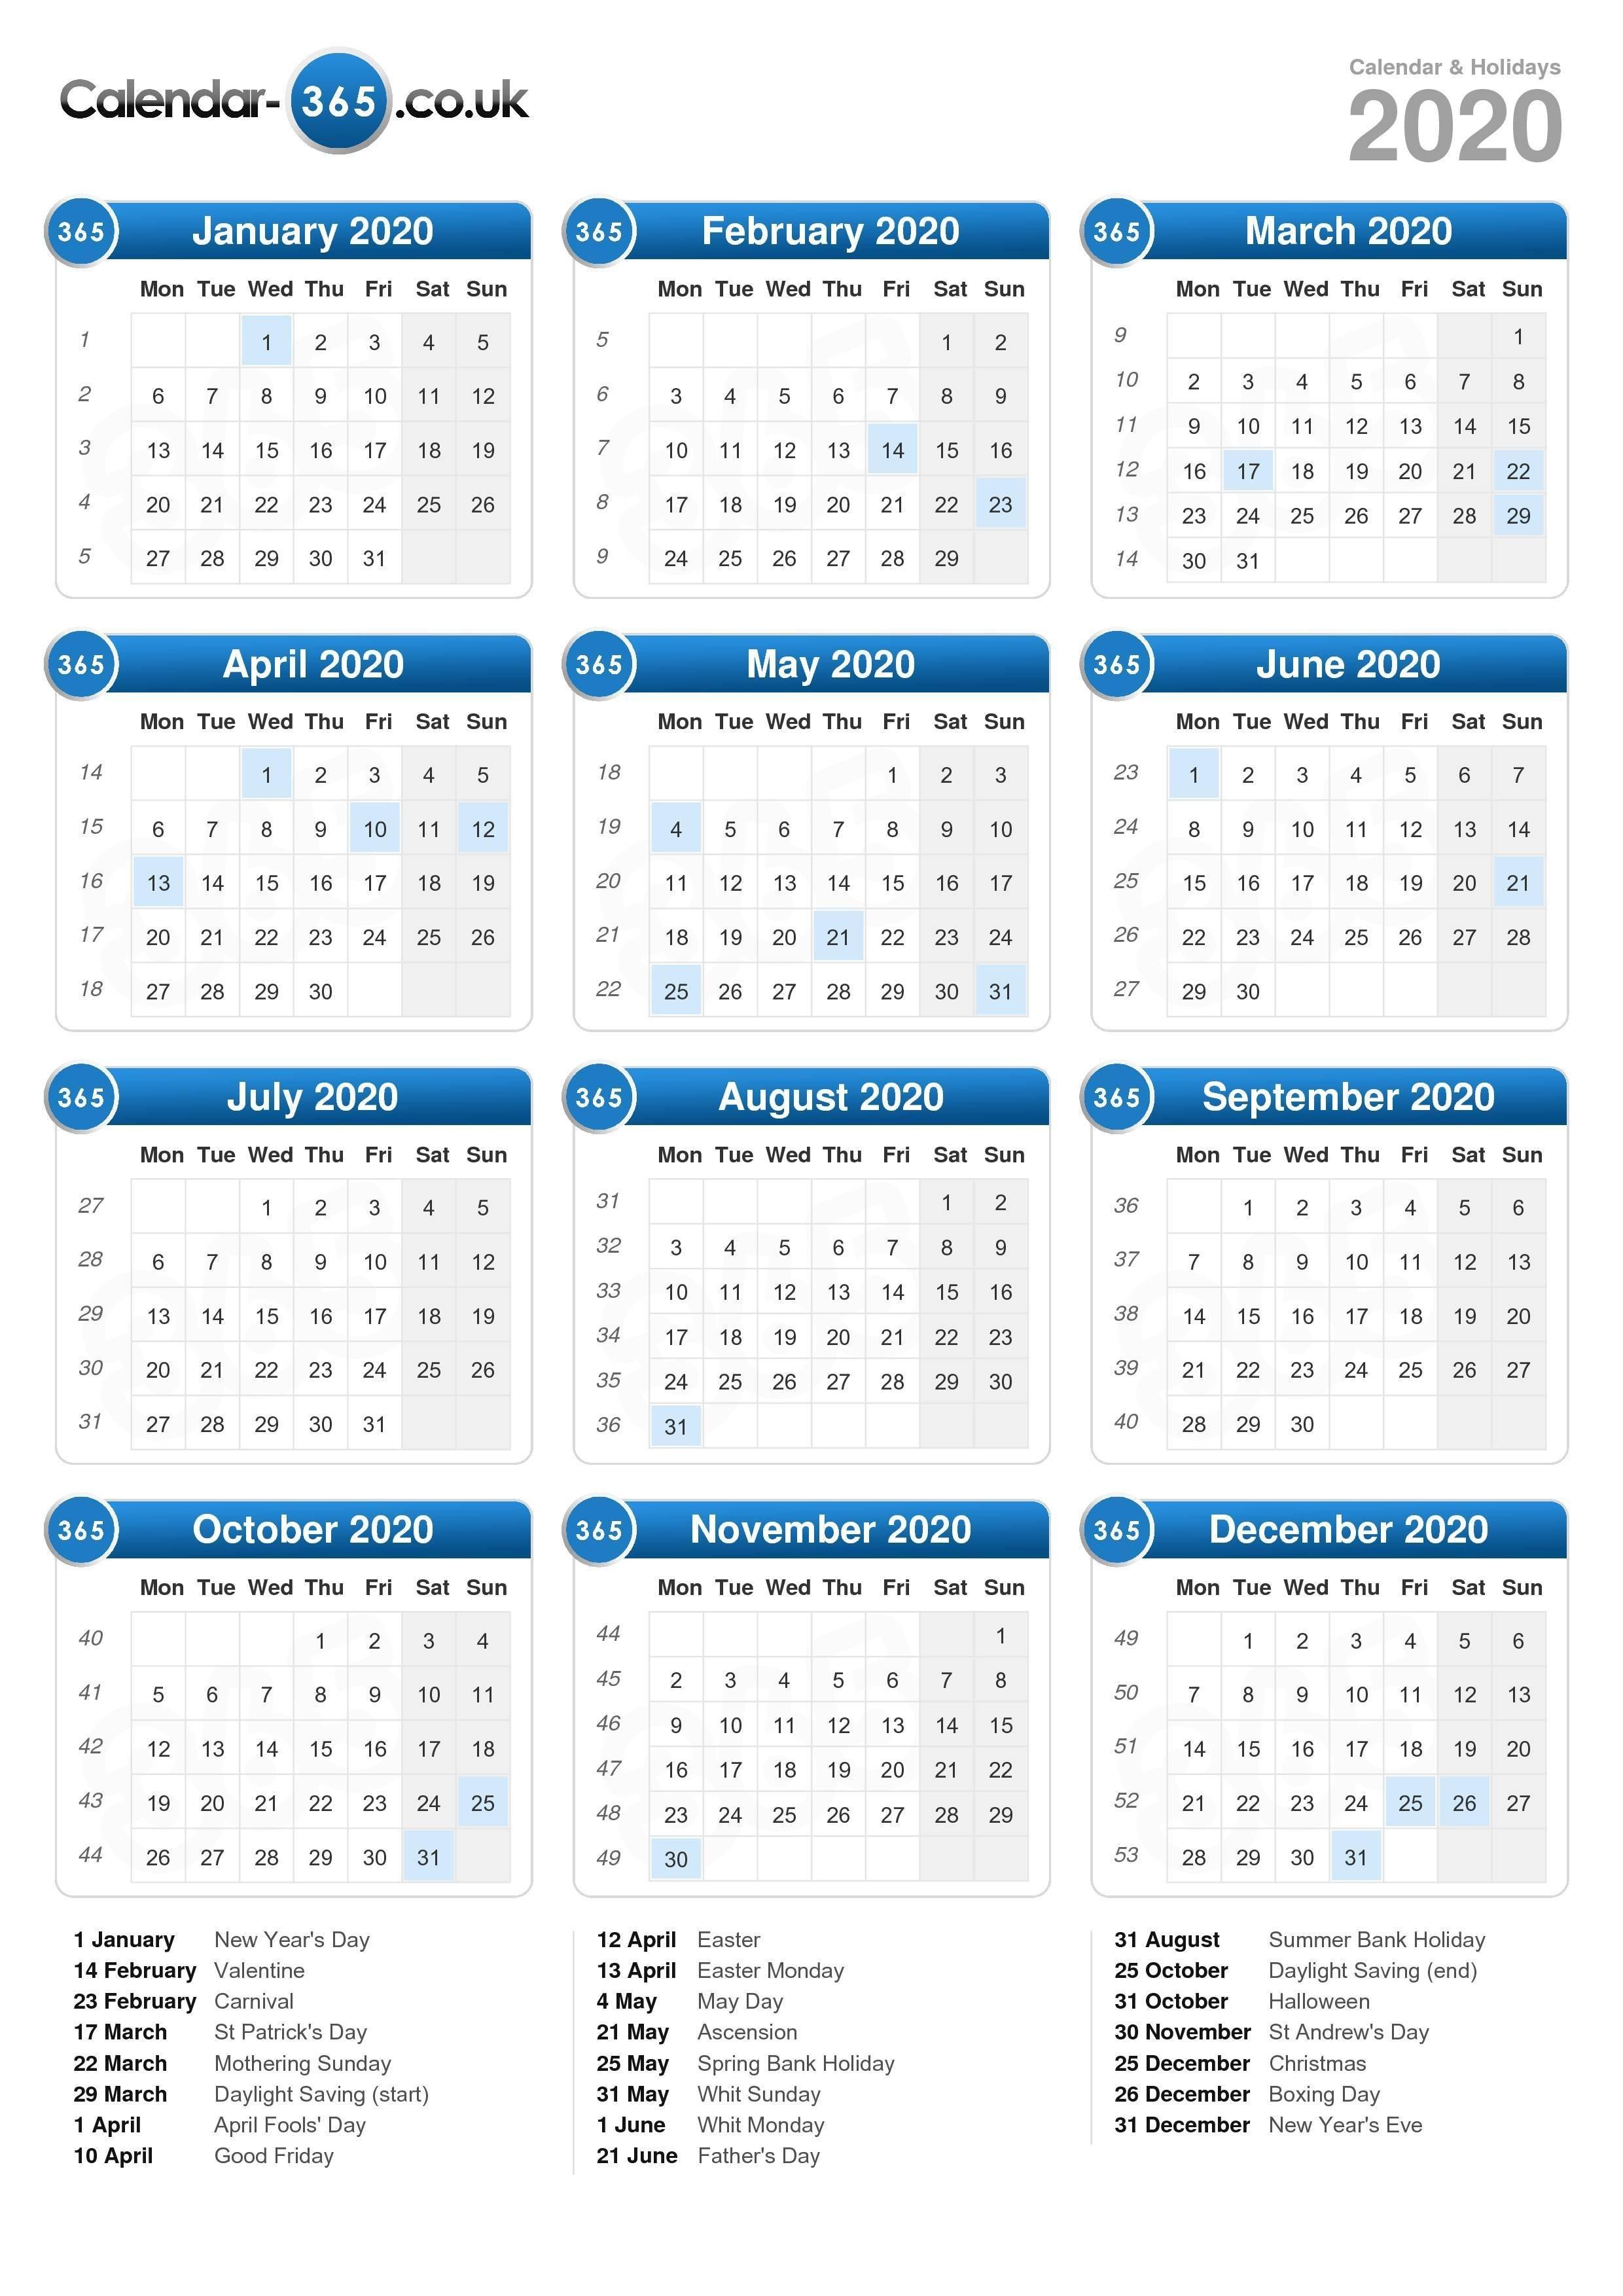 Calendar 2020-January 2020 Jewish Calendar